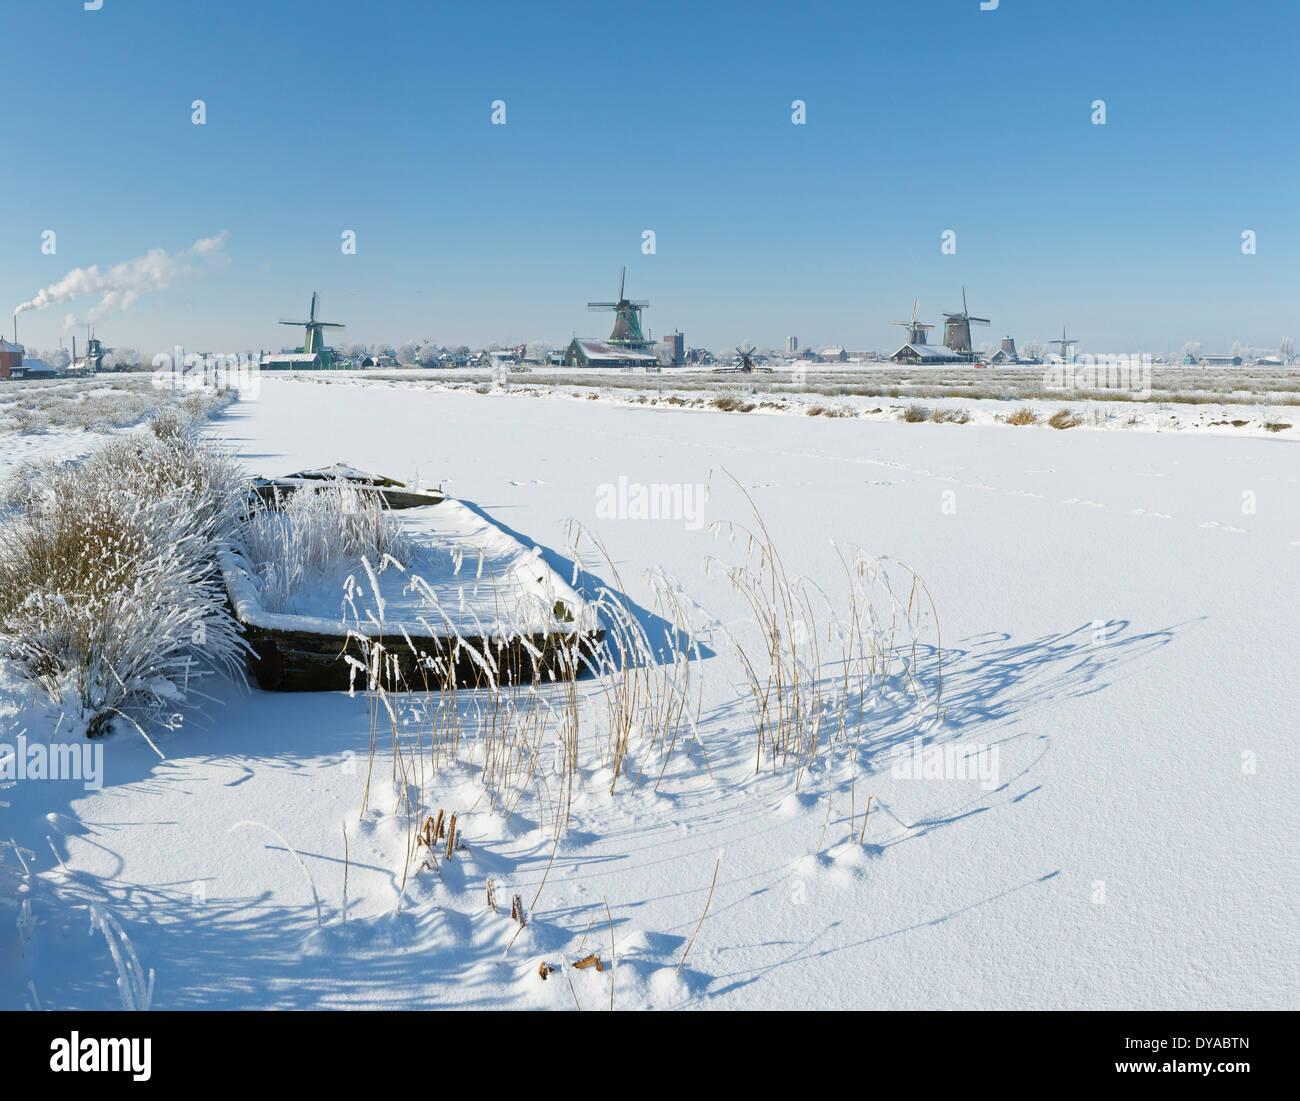 Netherlands, Holland, Europe, Zaandam, North Holland, windmill, field, meadow, winter, snow, ice, Windmills Stock Photo